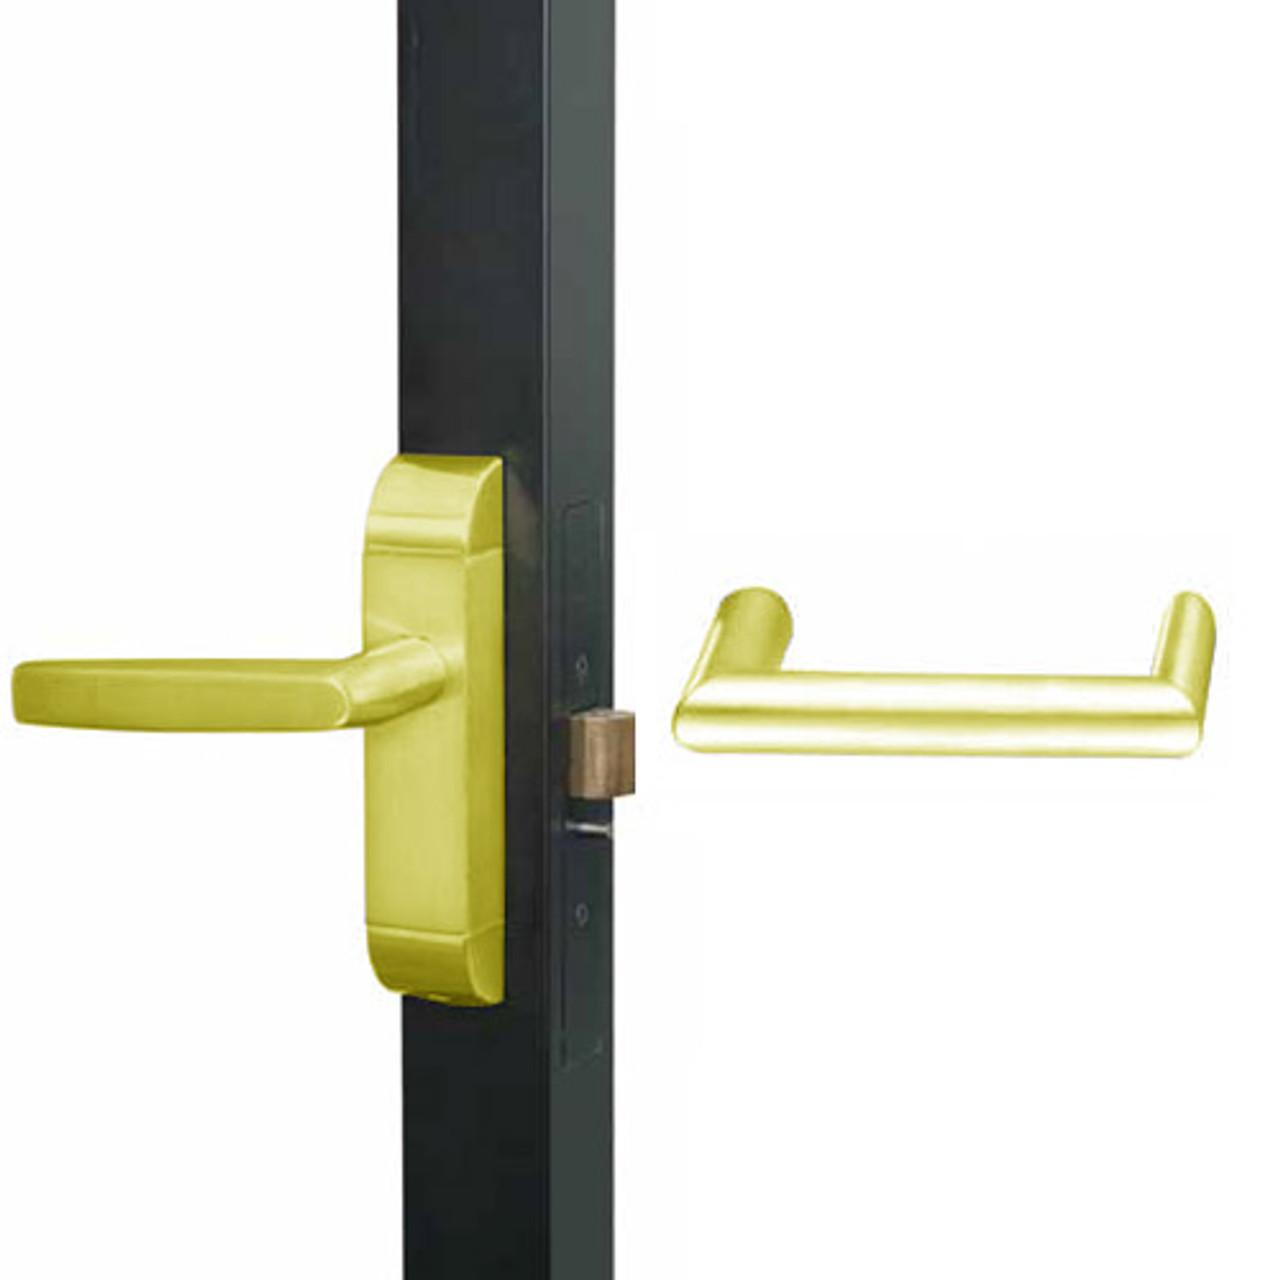 4600M-MW-631-US3 Adams Rite MW Designer Deadlatch handle in Bright Brass Finish